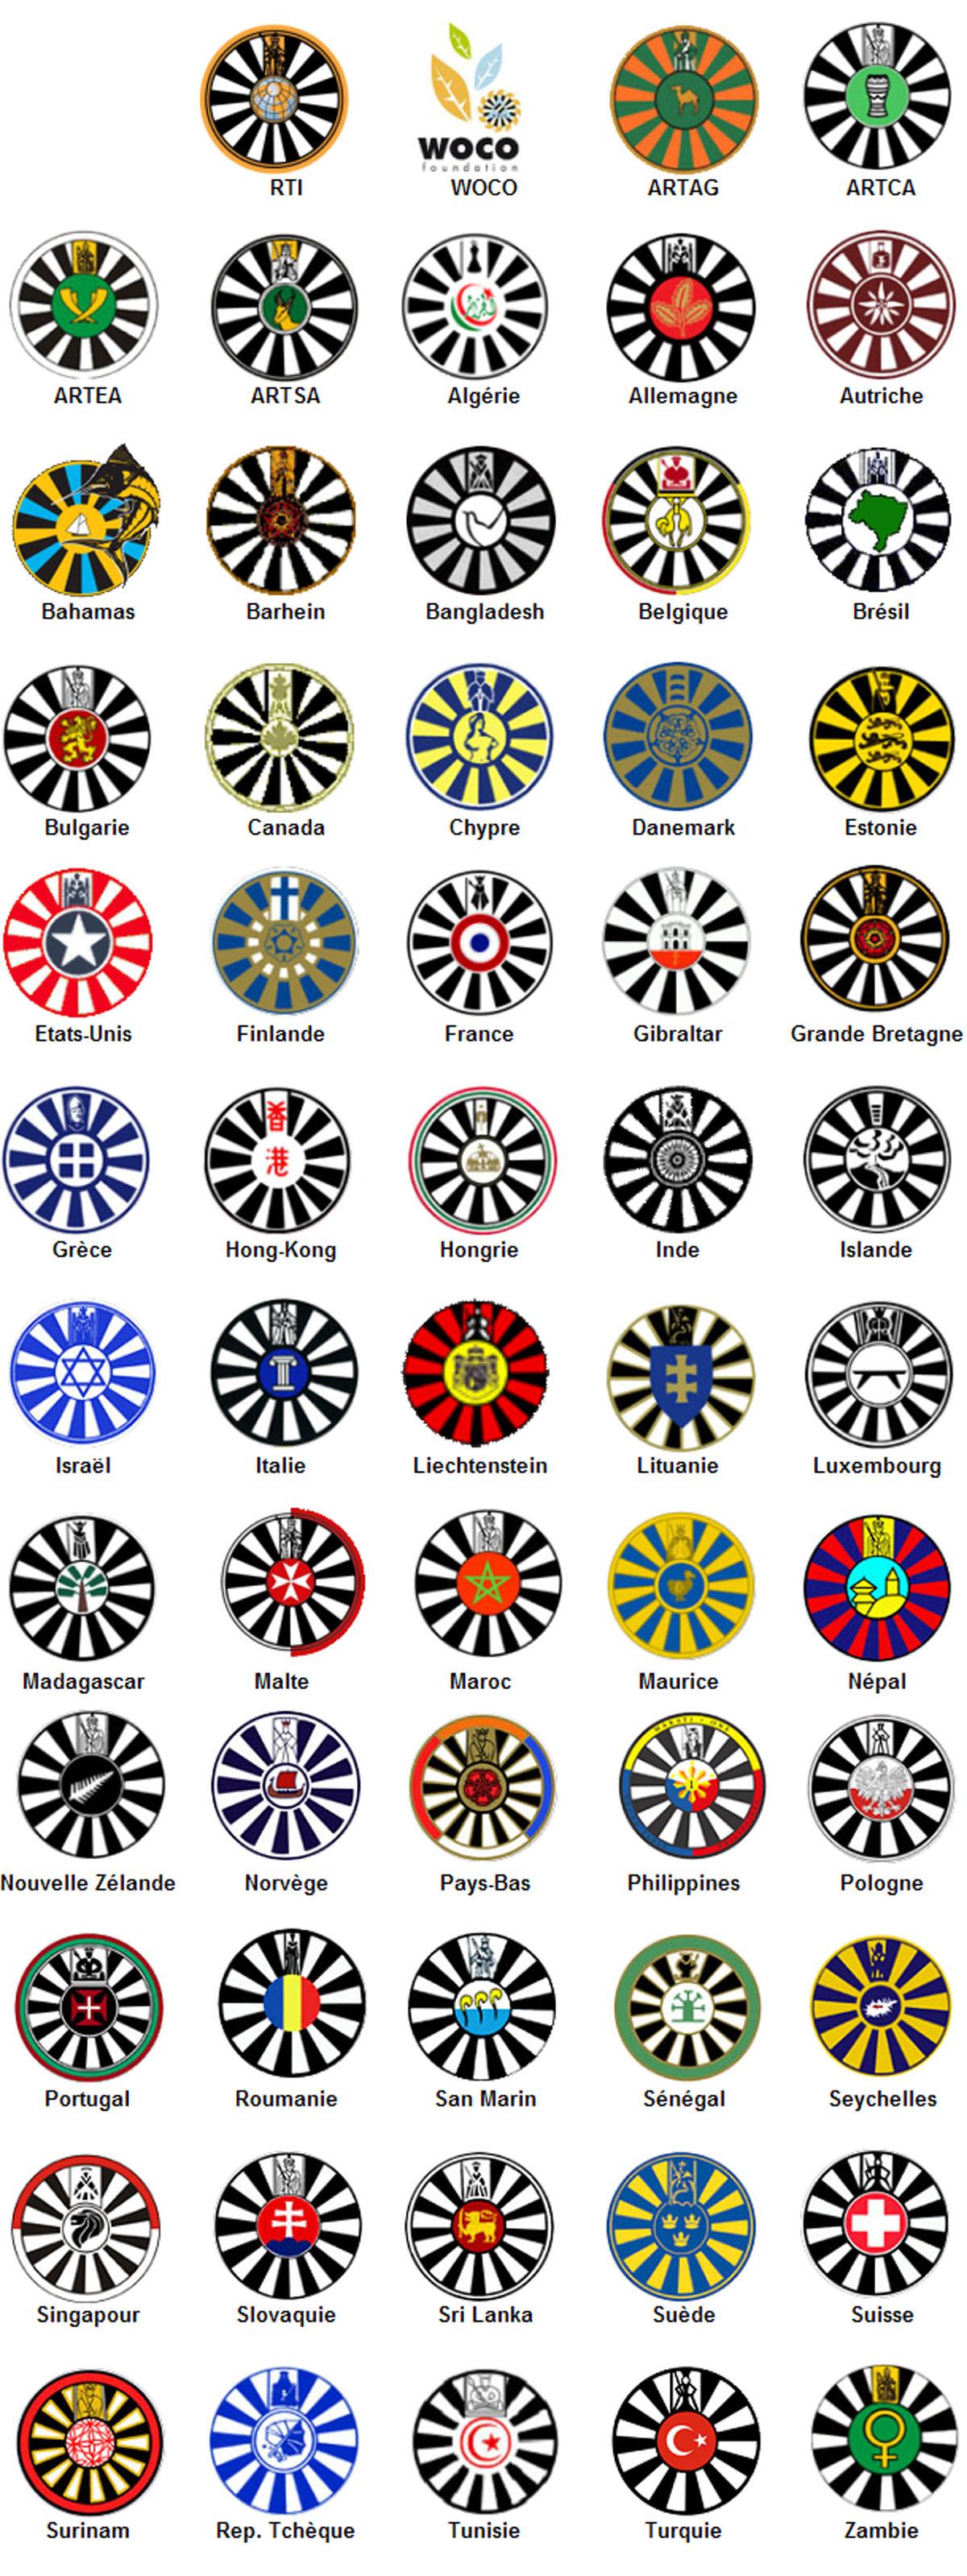 https://upload.wikimedia.org/wikipedia/commons/2/2c/59RTlogos.jpg